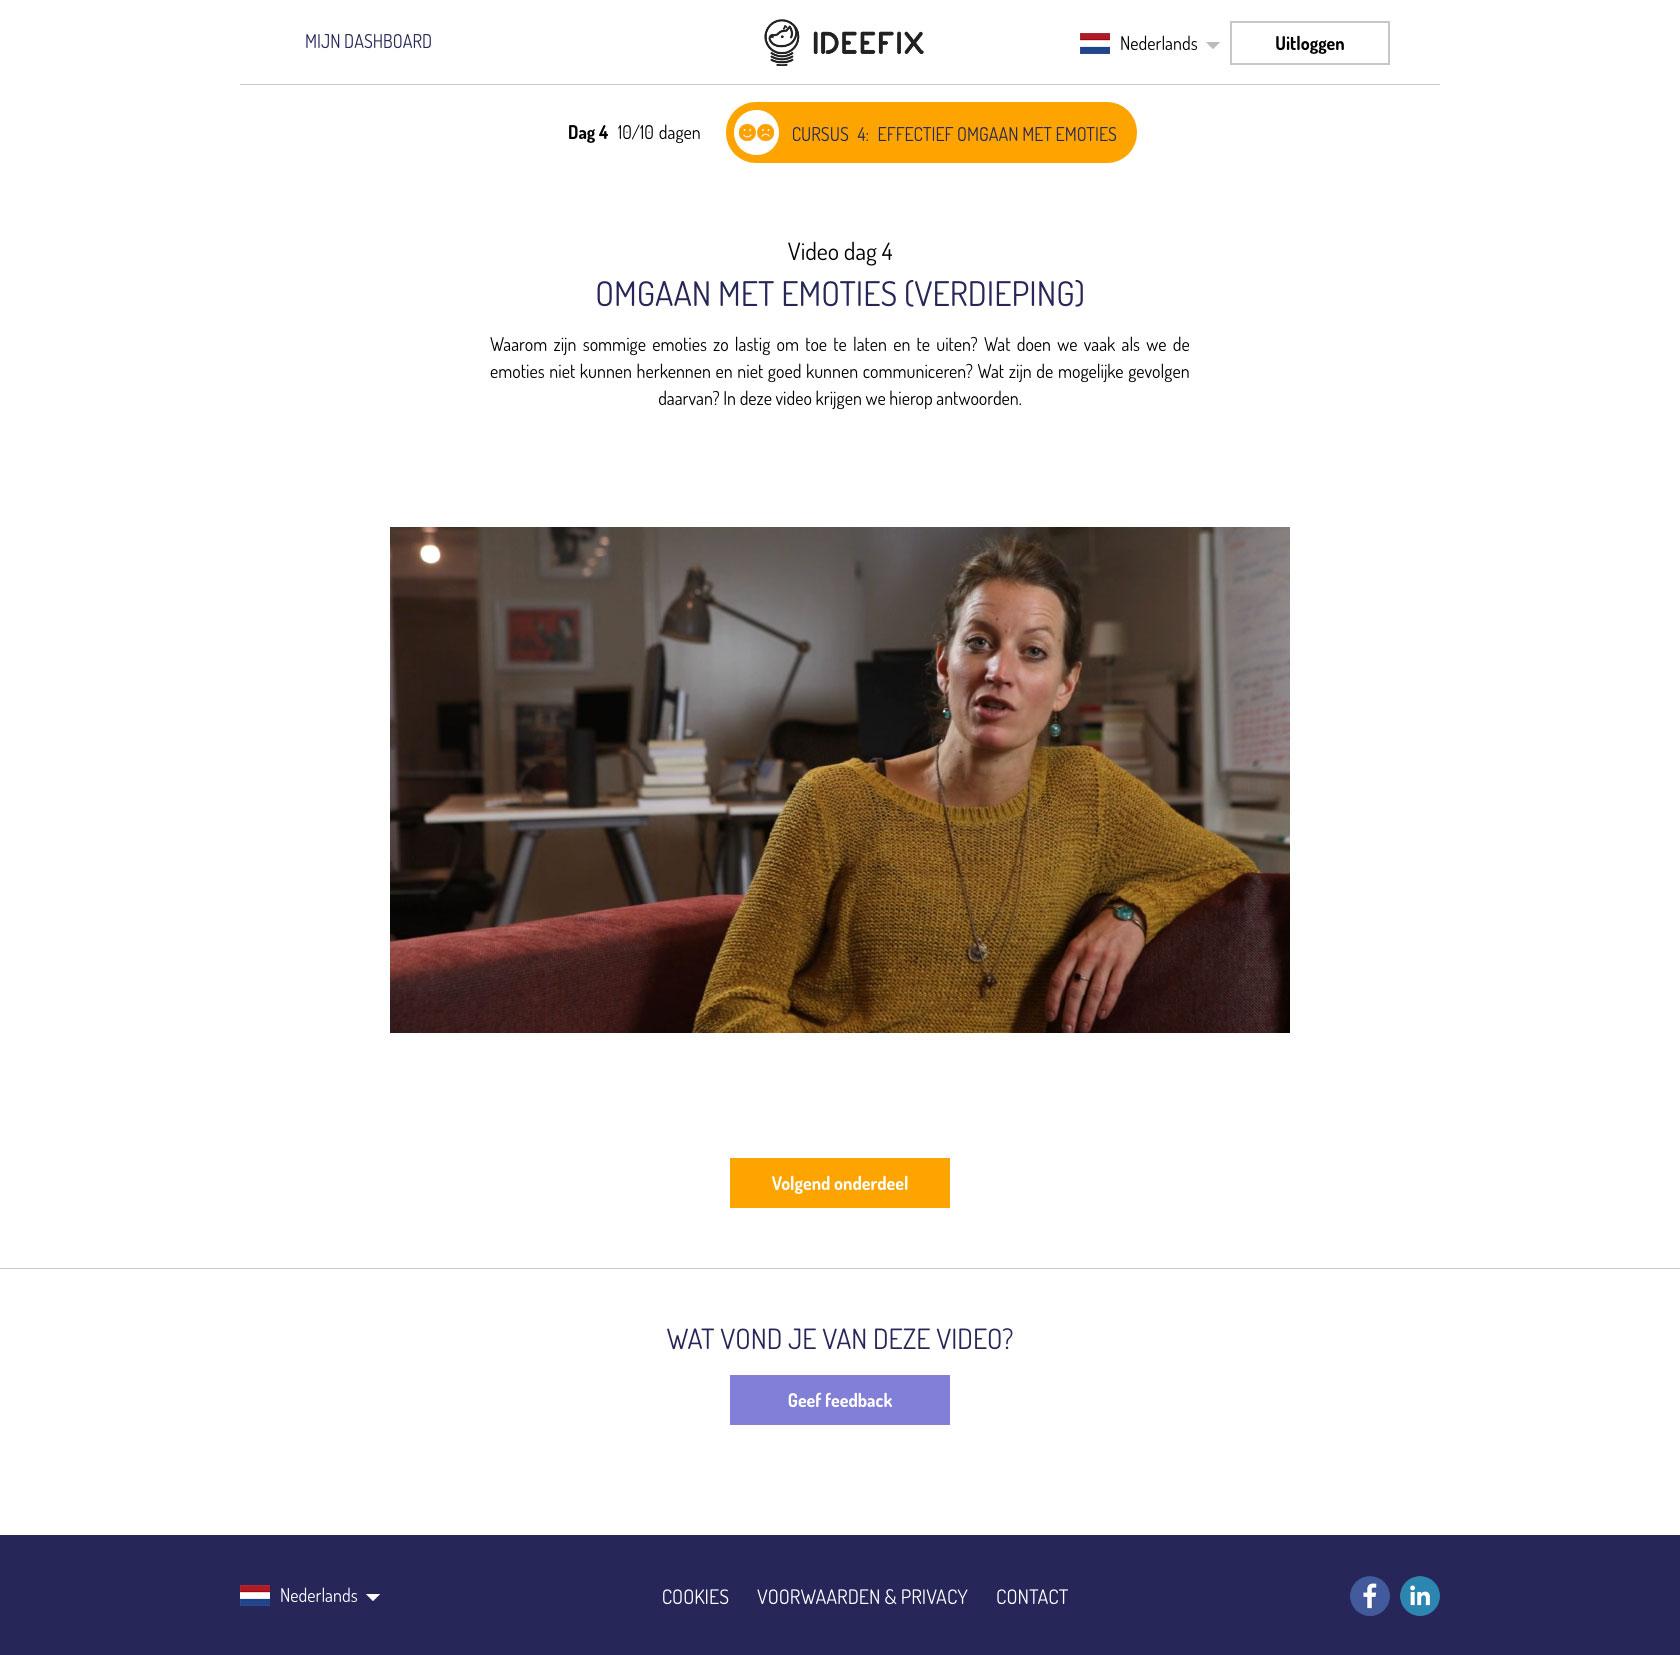 https://ideefix-cdn.s3.eu-central-1.amazonaws.com/module_screenshot/UvQaUhcgAjEeJGFgM0o3_picture.jpg